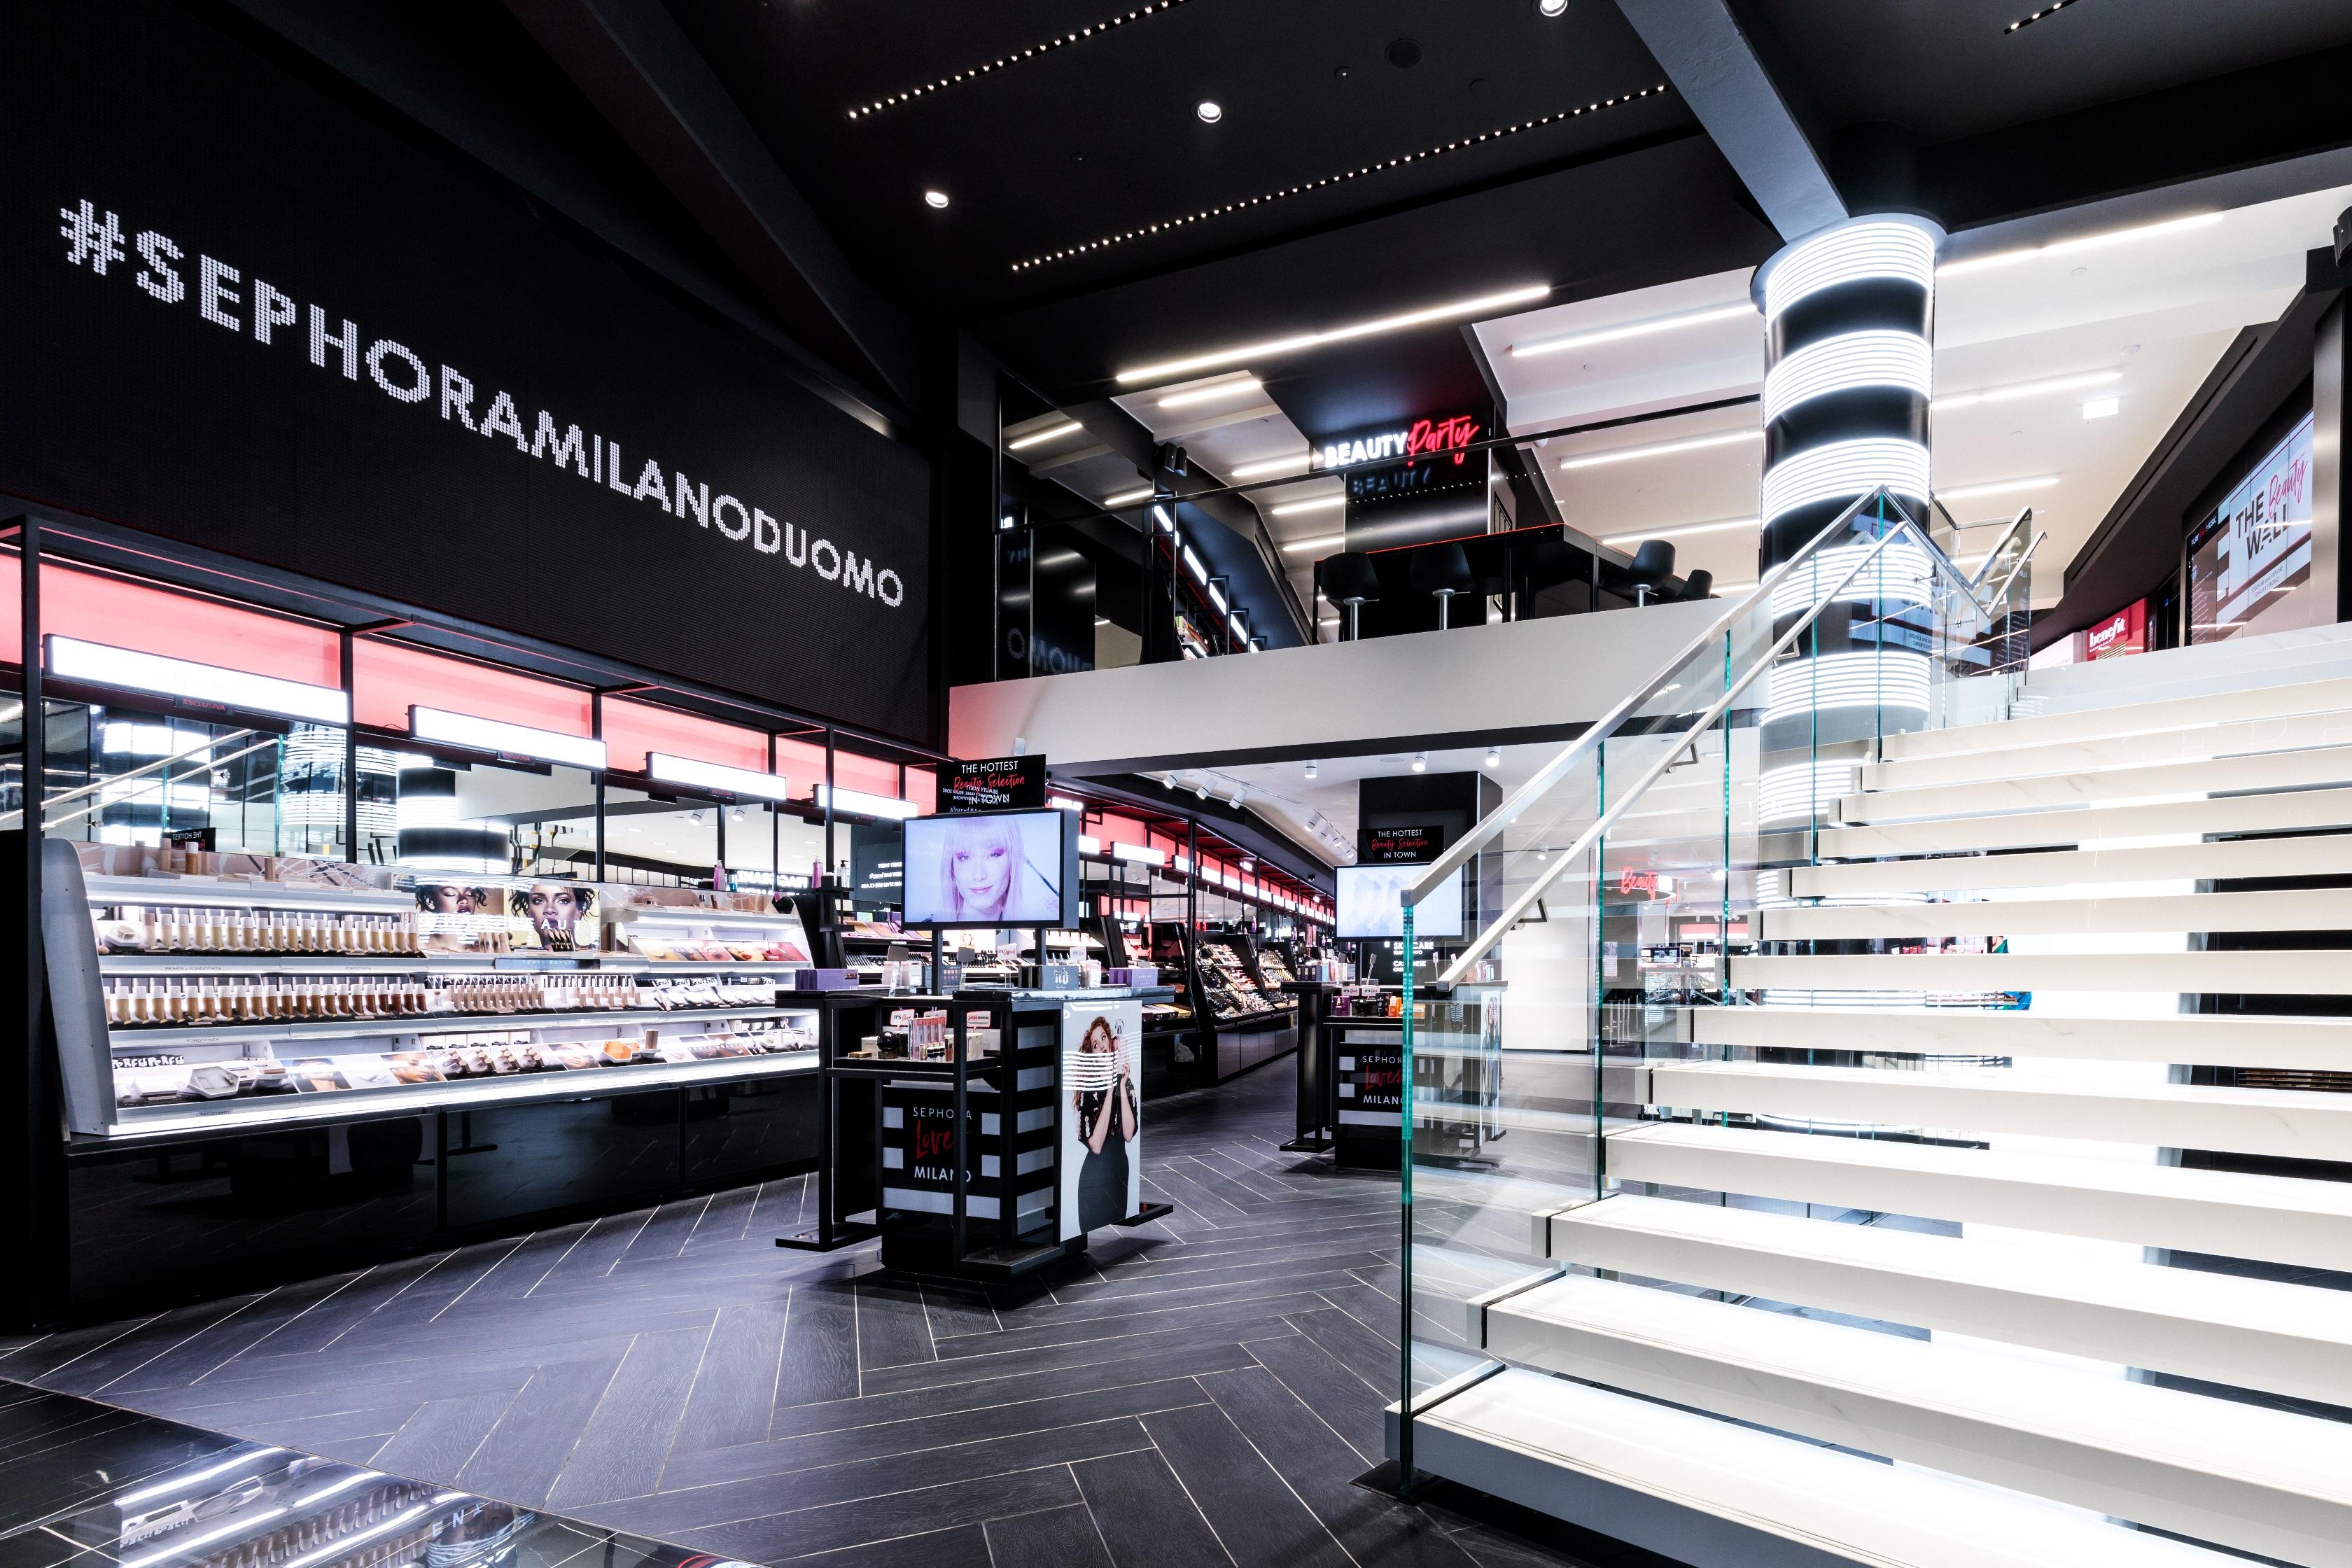 Nuovo Flagship Store Sephora Milano Duomo - Piano terra